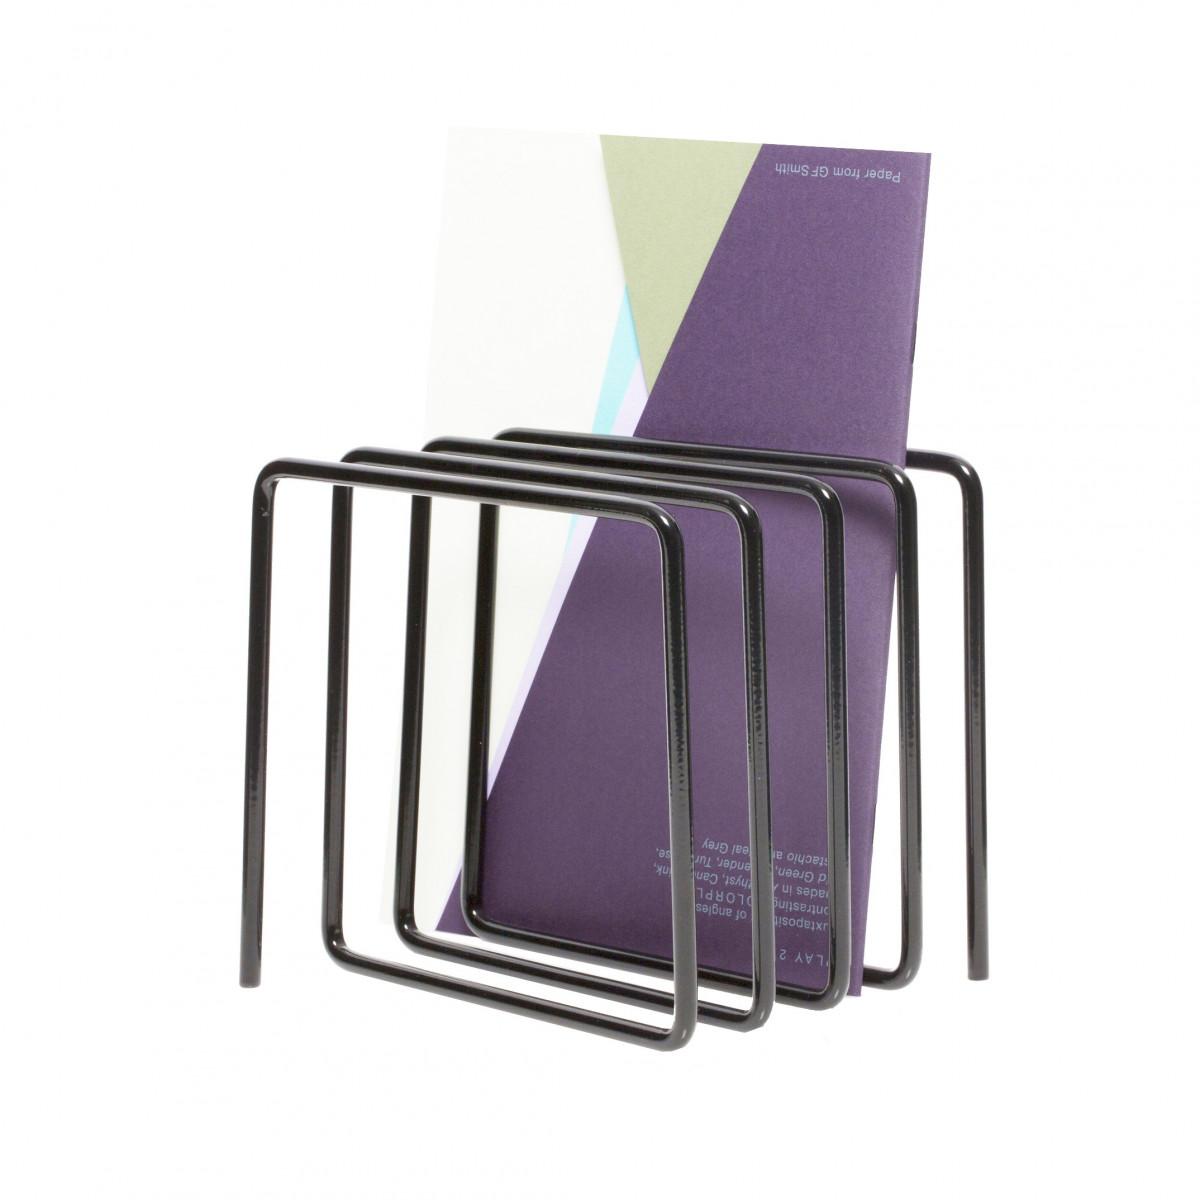 range courrier porte revues design noir. Black Bedroom Furniture Sets. Home Design Ideas